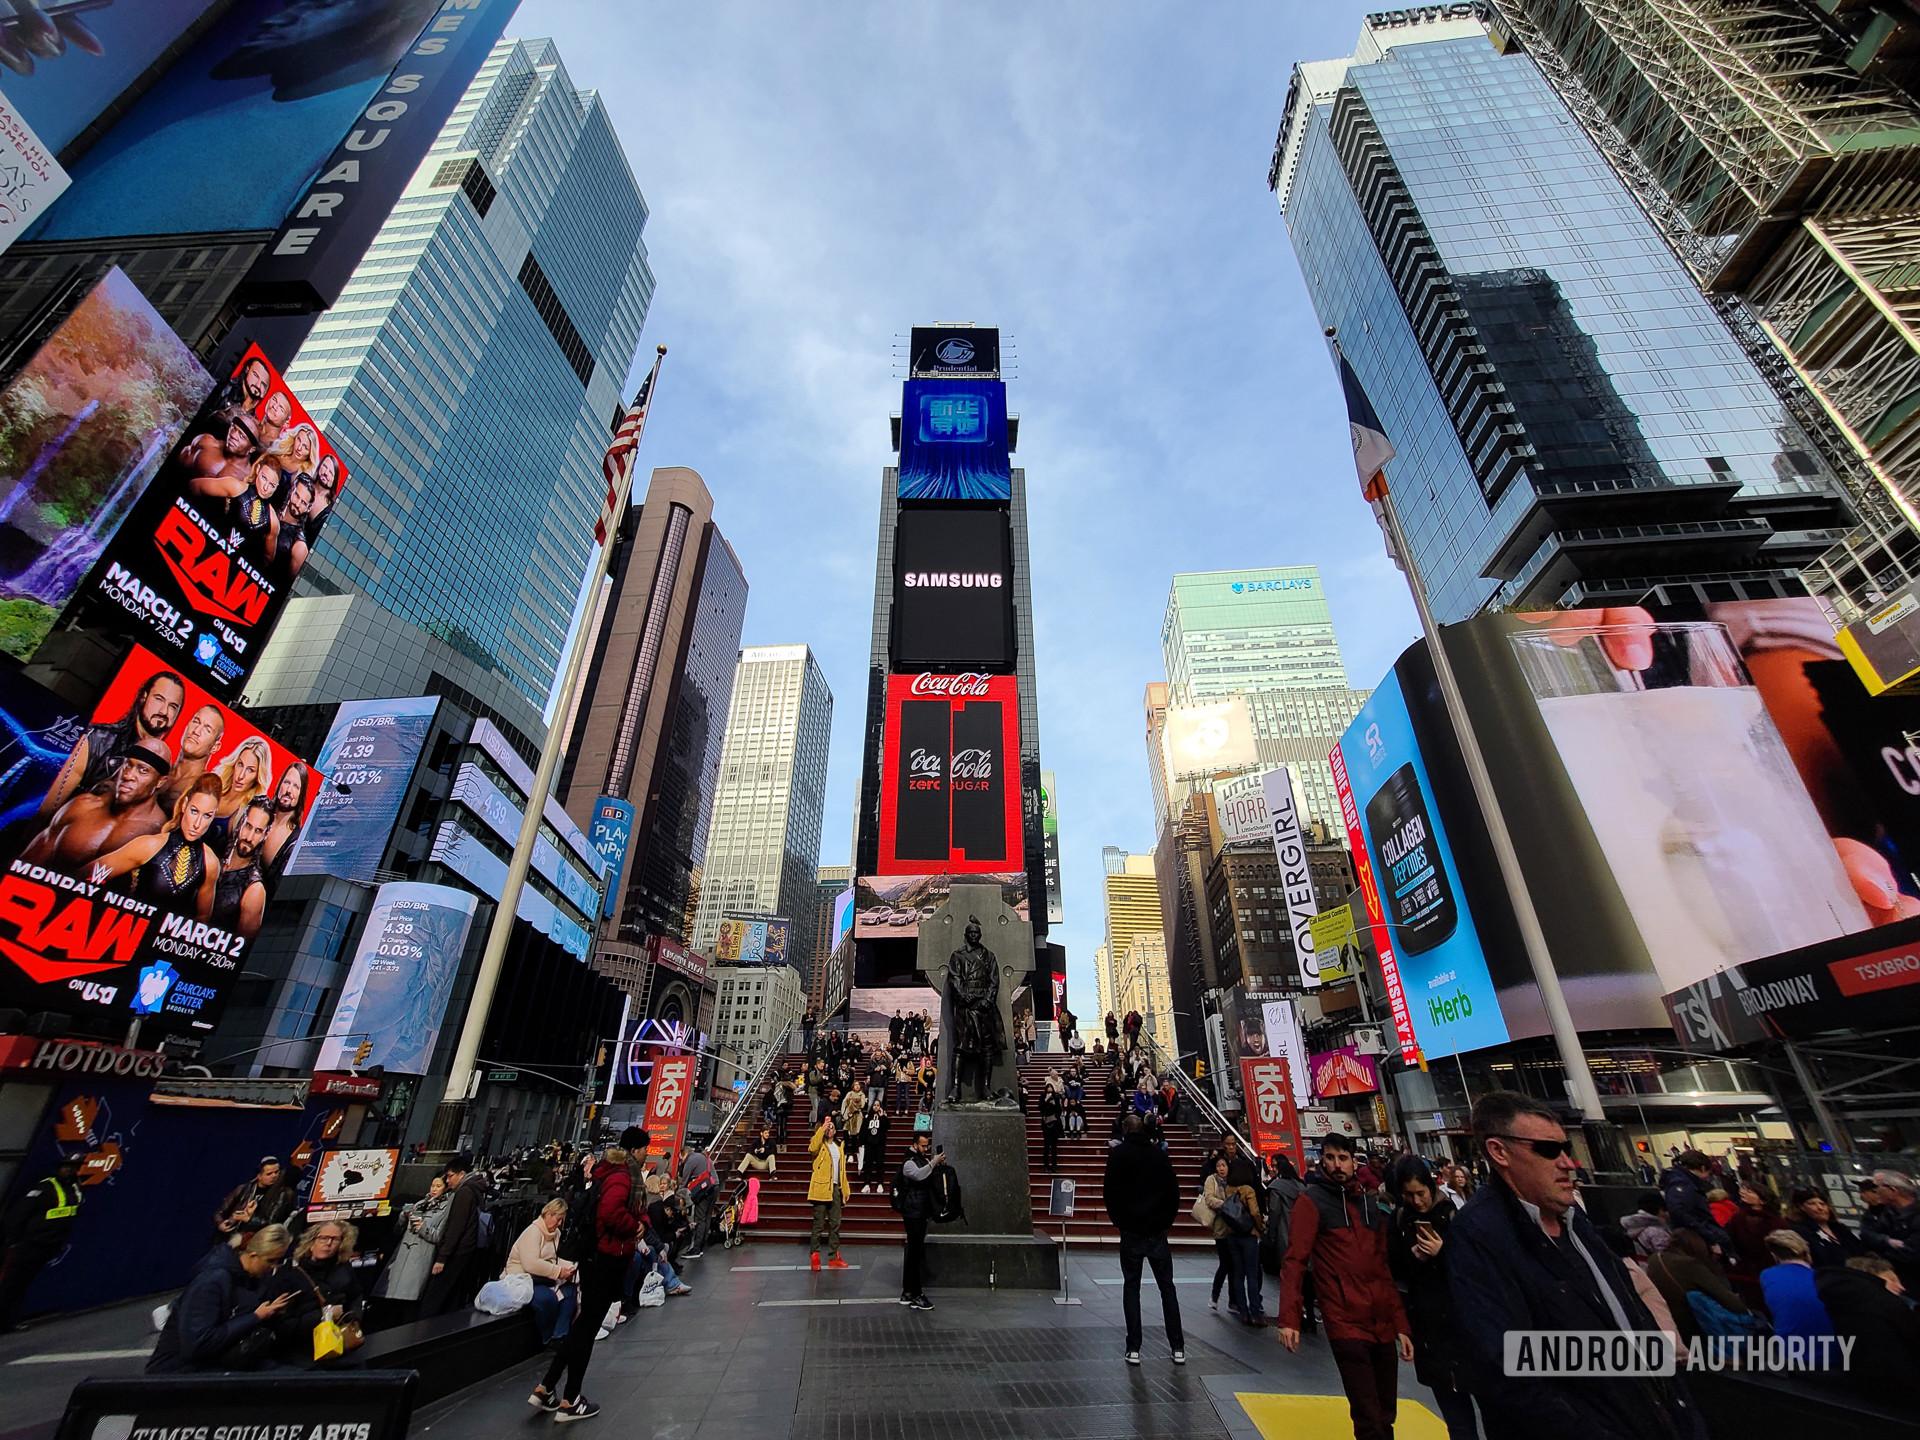 Samsung Galaxy S20 Ultra 5G photo sample NYC